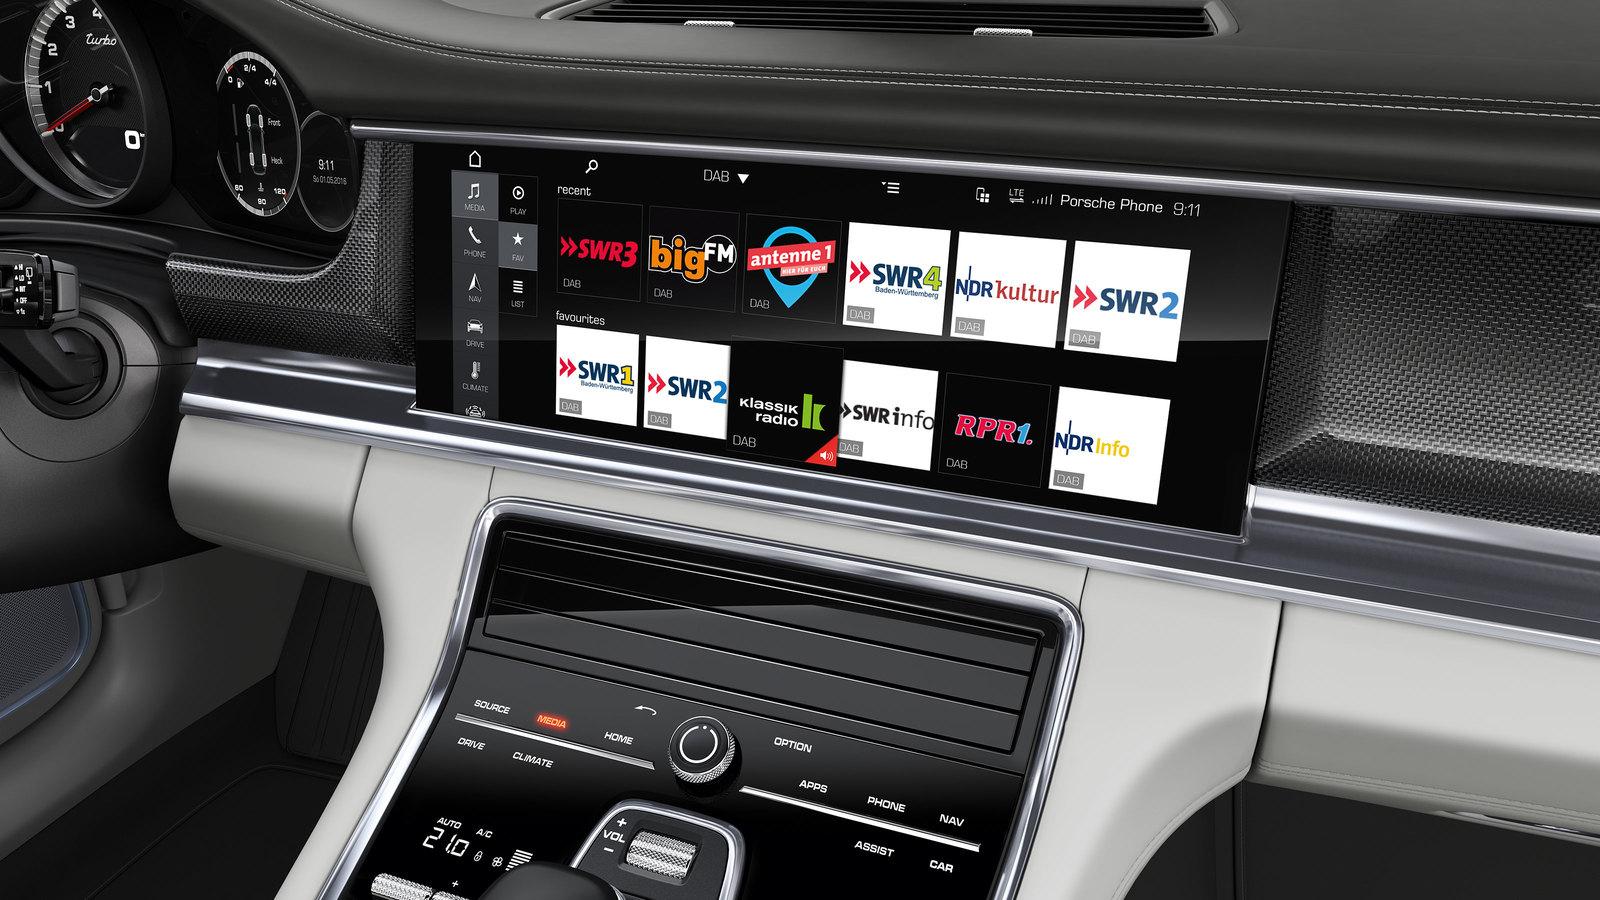 tech features in the 2017 Porsche Panamera